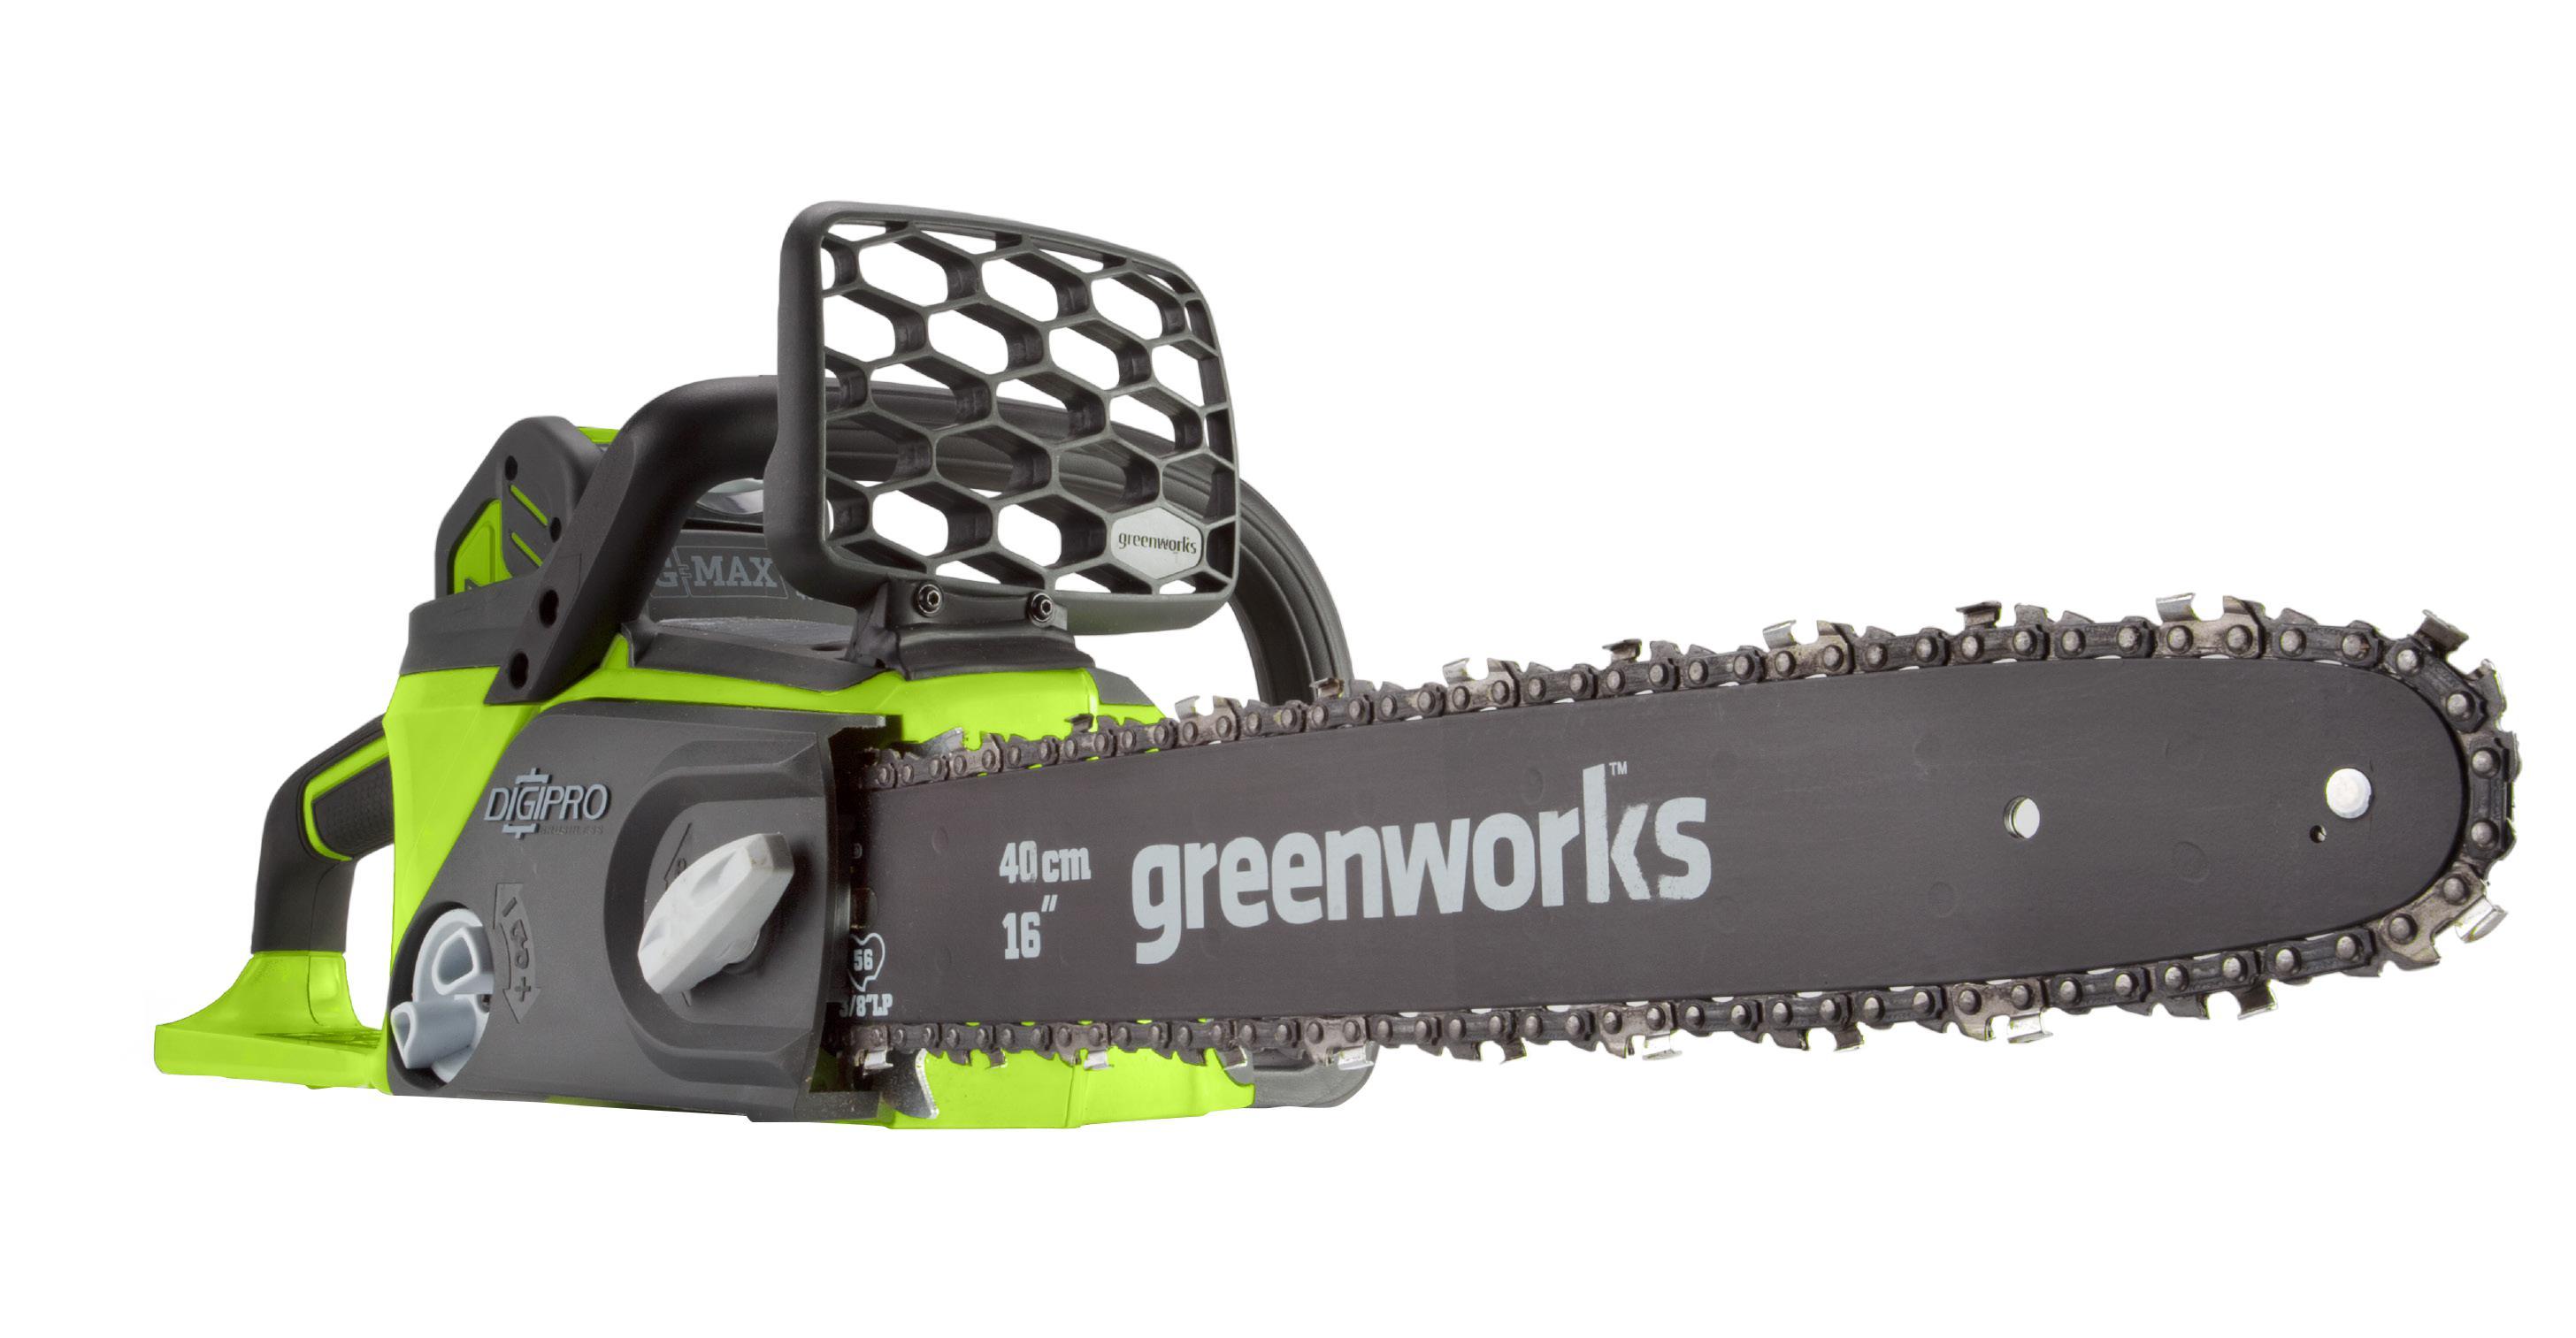 Пила цепная аккумуляторная Greenworks Gd40cs40k2 (20077ua) 1акк 40В 4Ач + ЗУ